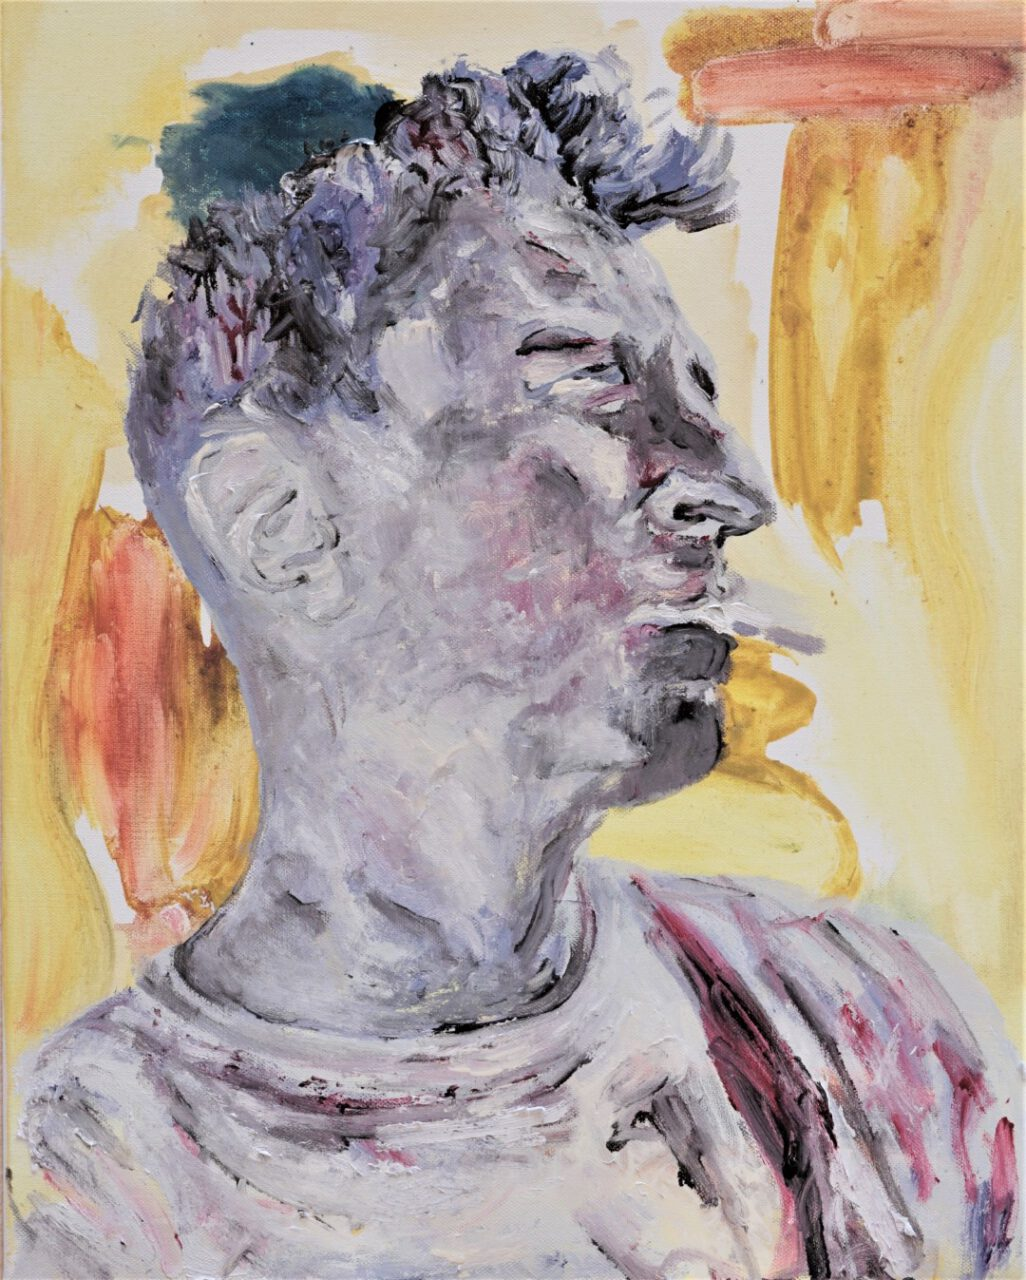 Le Dandy, 2020, Acrylic, pigments on canvas, 49,5 x 39,8 cm